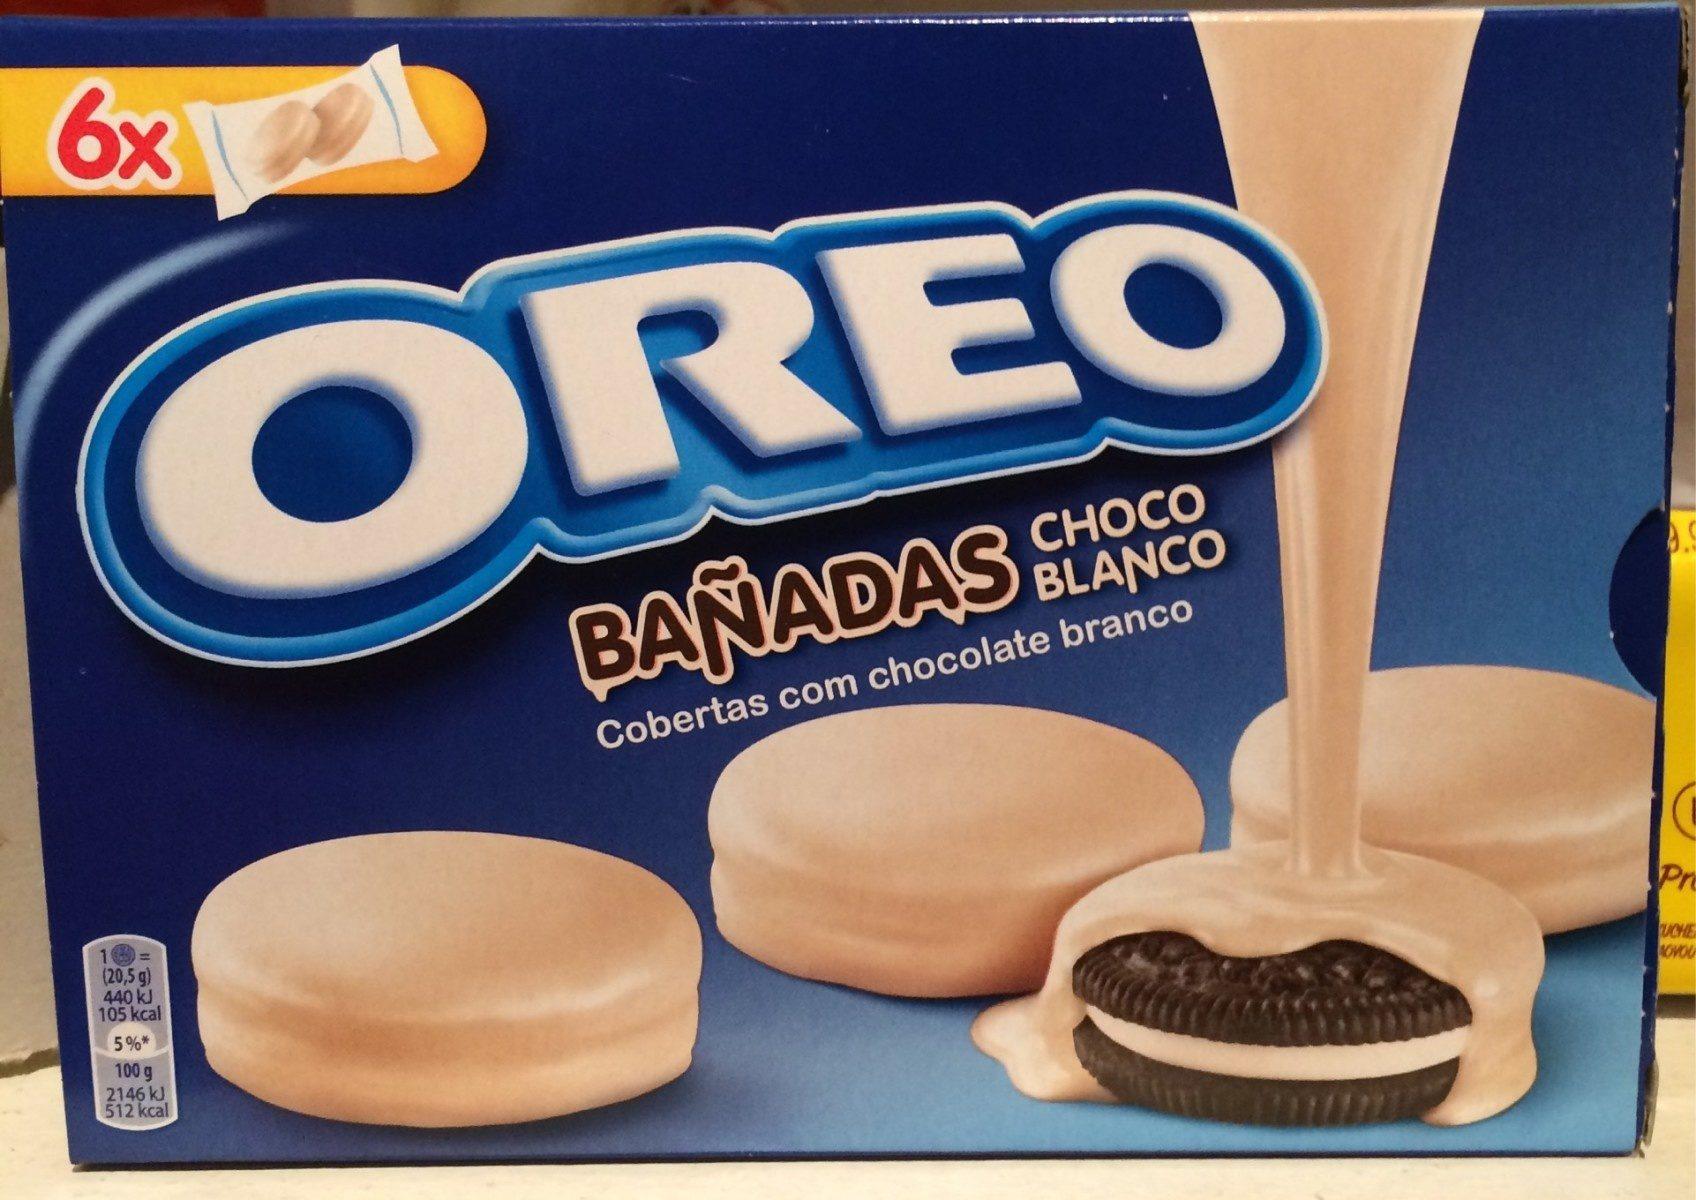 Bañadas chocolate blanco - Product - fr